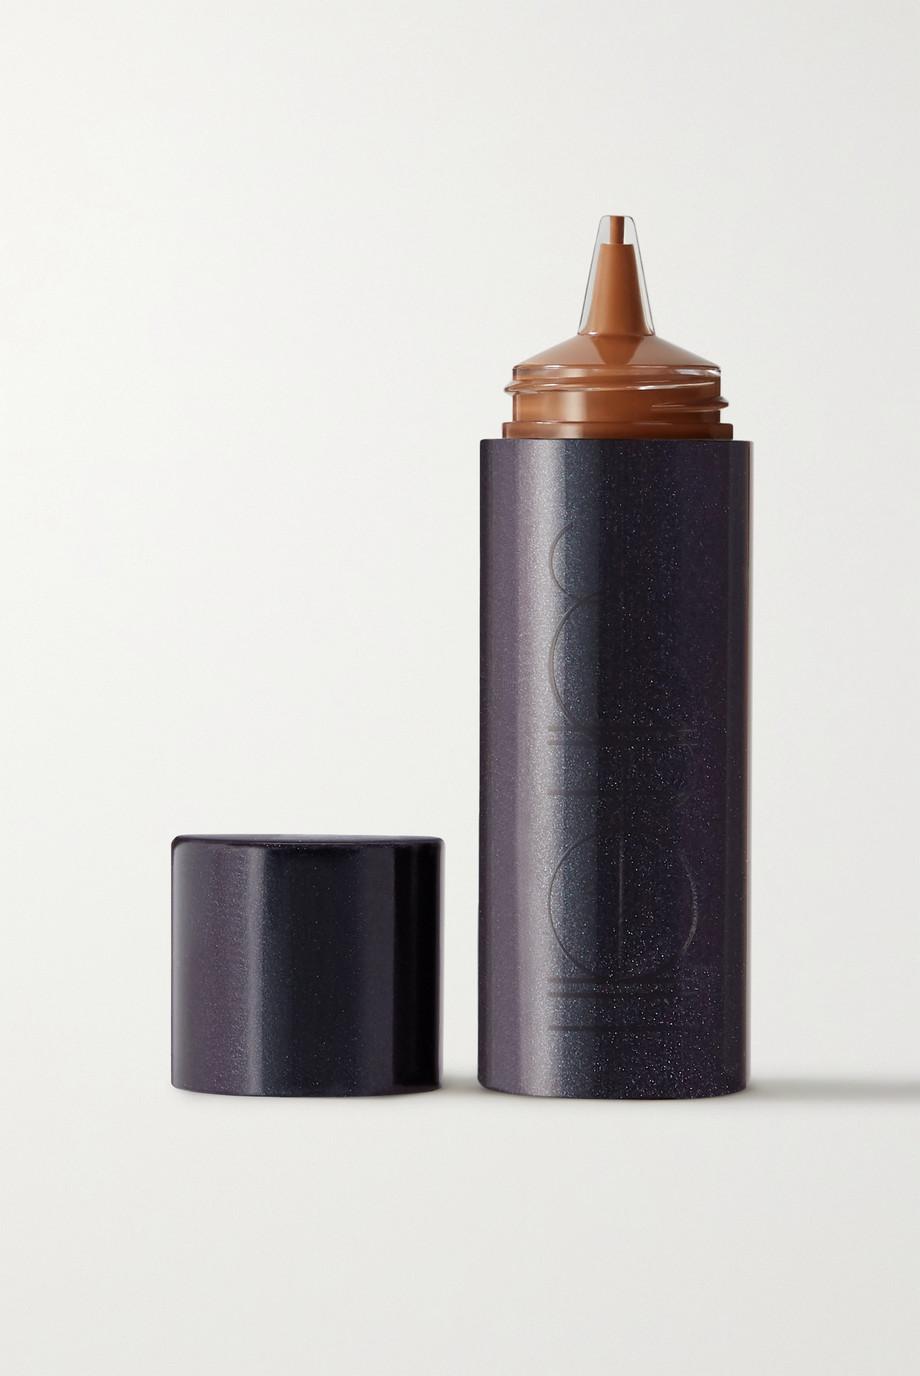 Surratt Beauty Dew Drop Foundation – 16, 19 ml – Foundation